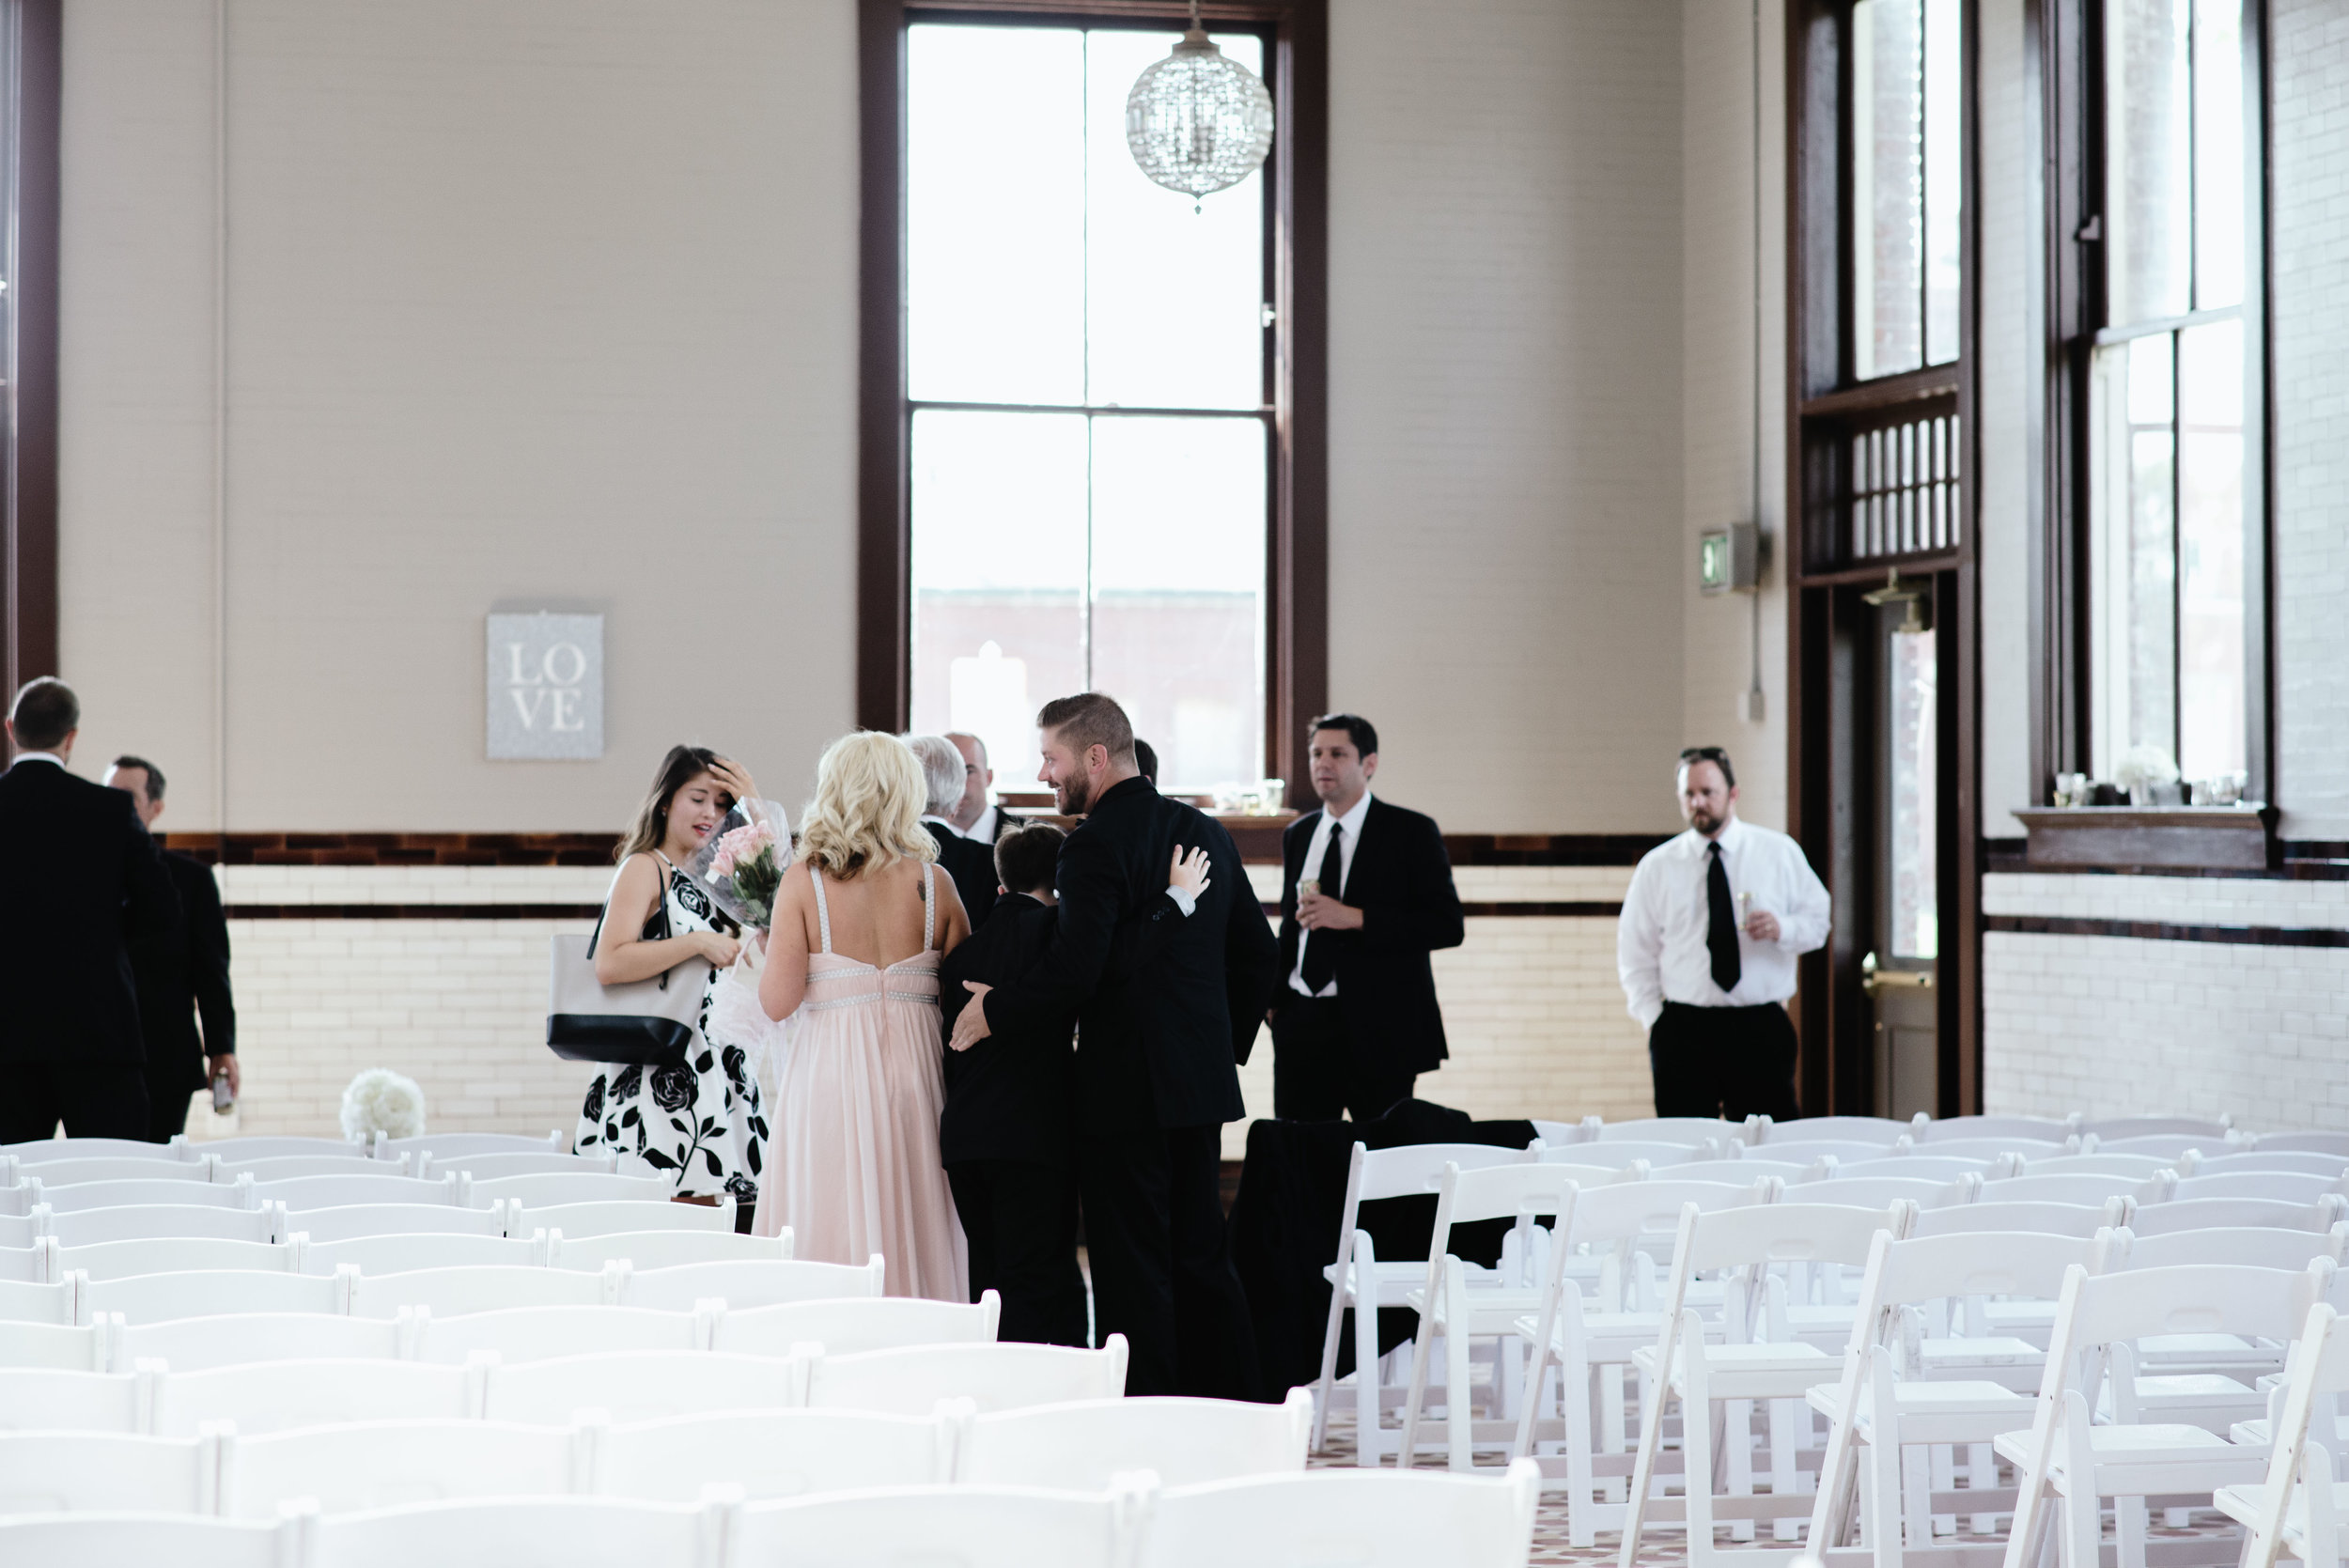 Mina-Steve-Blog-Indianapolis-Wedding-67.jpg